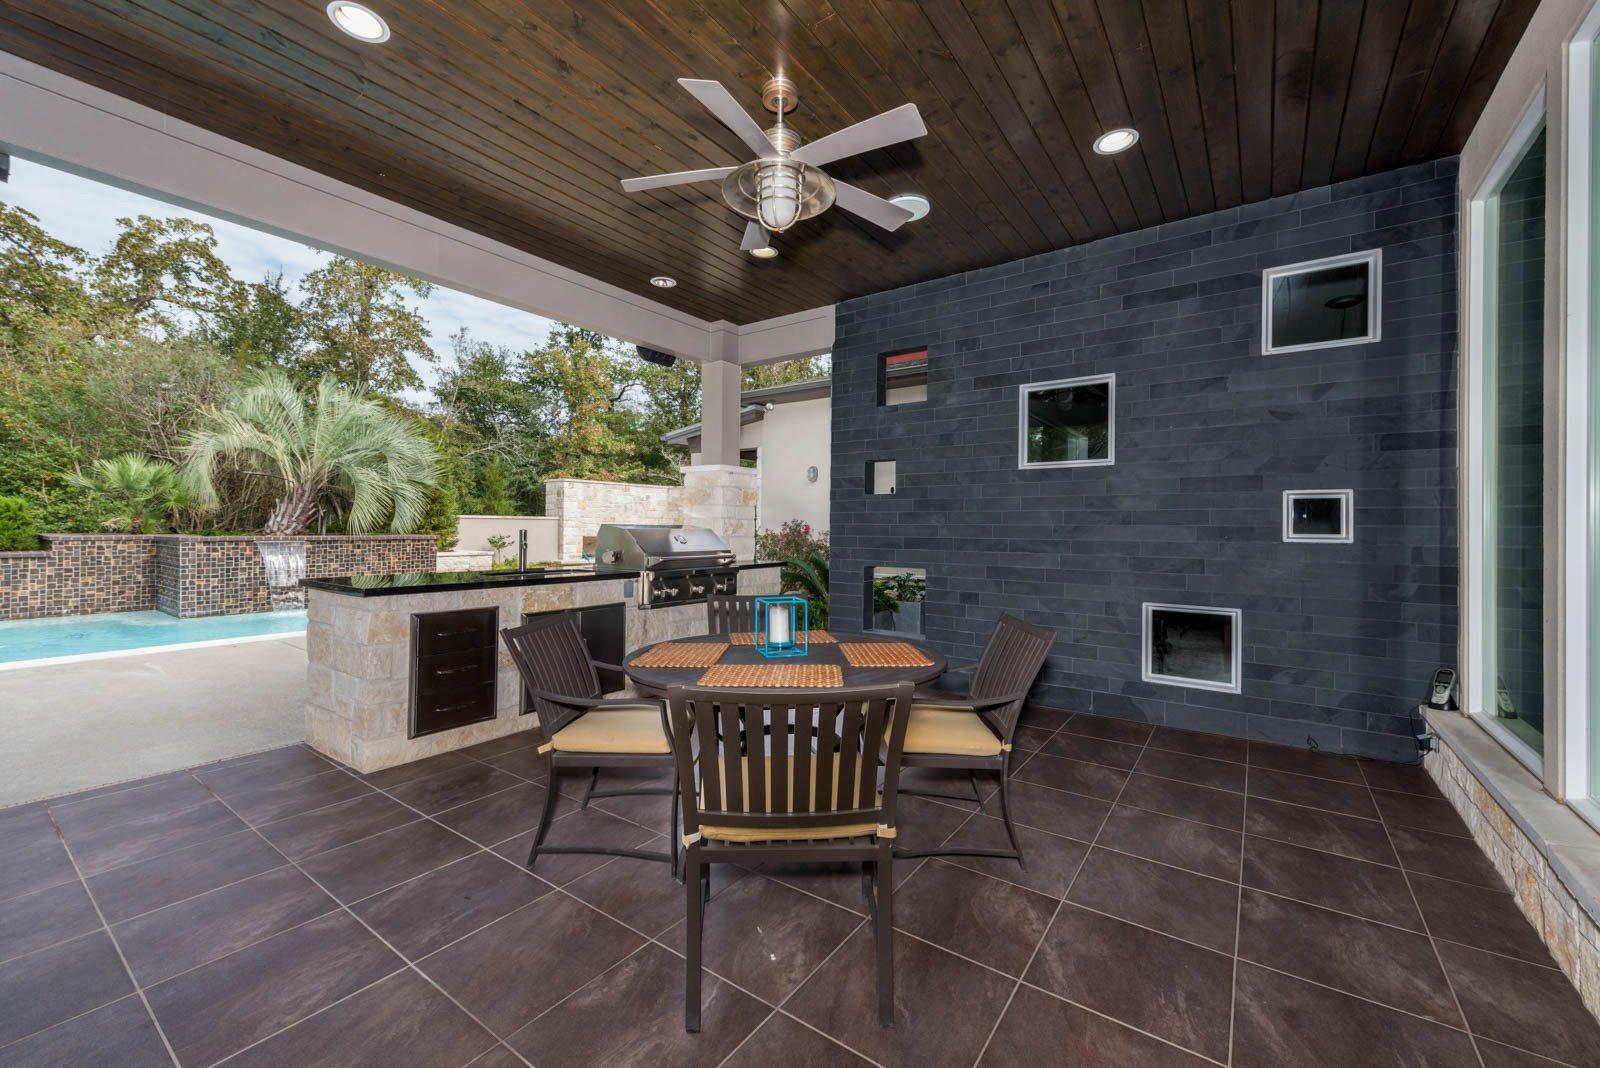 Outdoor, Large Patio, Porch, Deck, Tile Patio, Porch, Deck, and Stone Patio, Porch, Deck Outdoor Living  The Carlson House